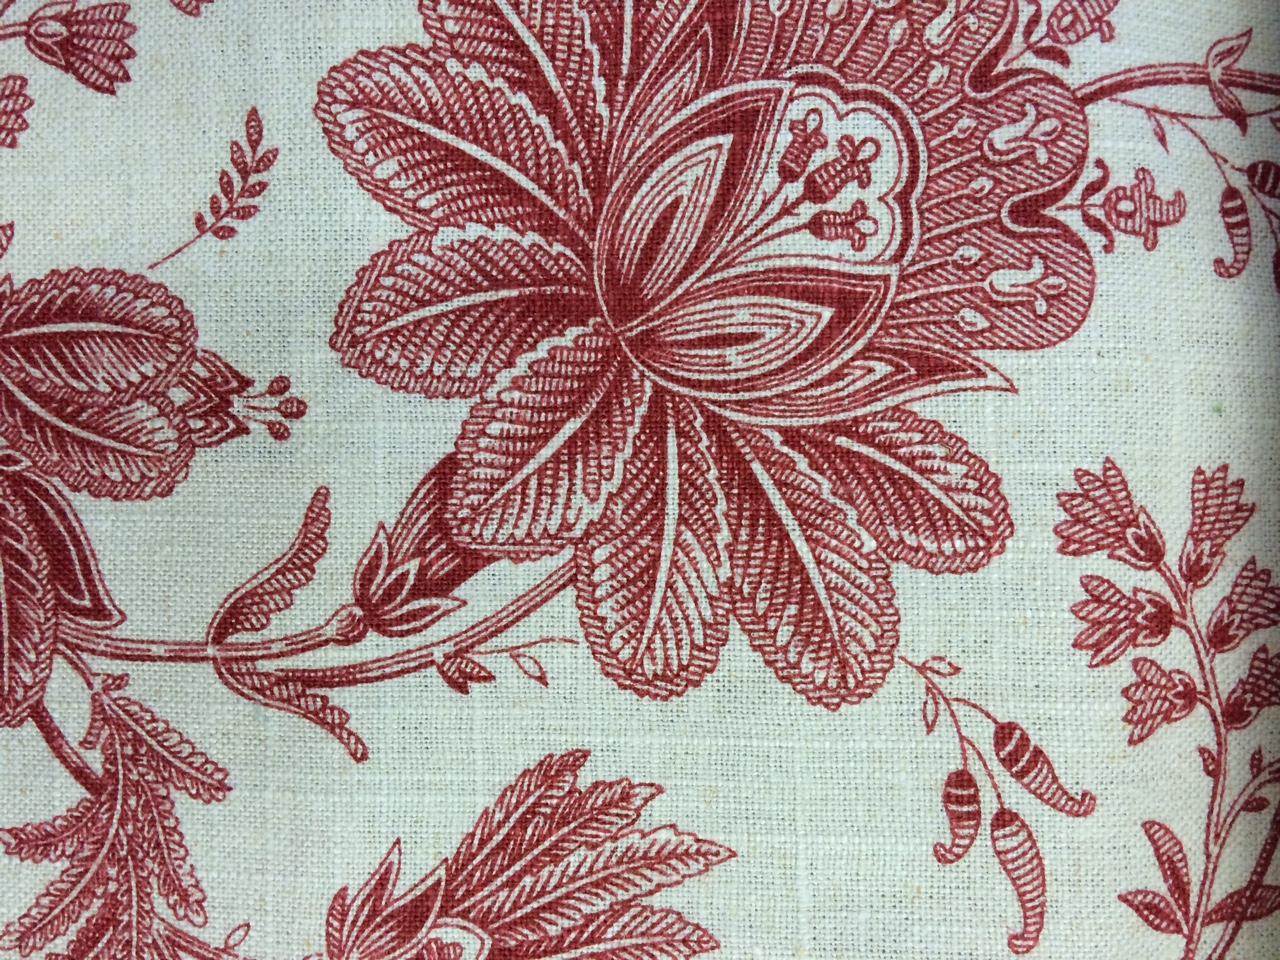 Red Flower Fabric Design at TWG Fabrics